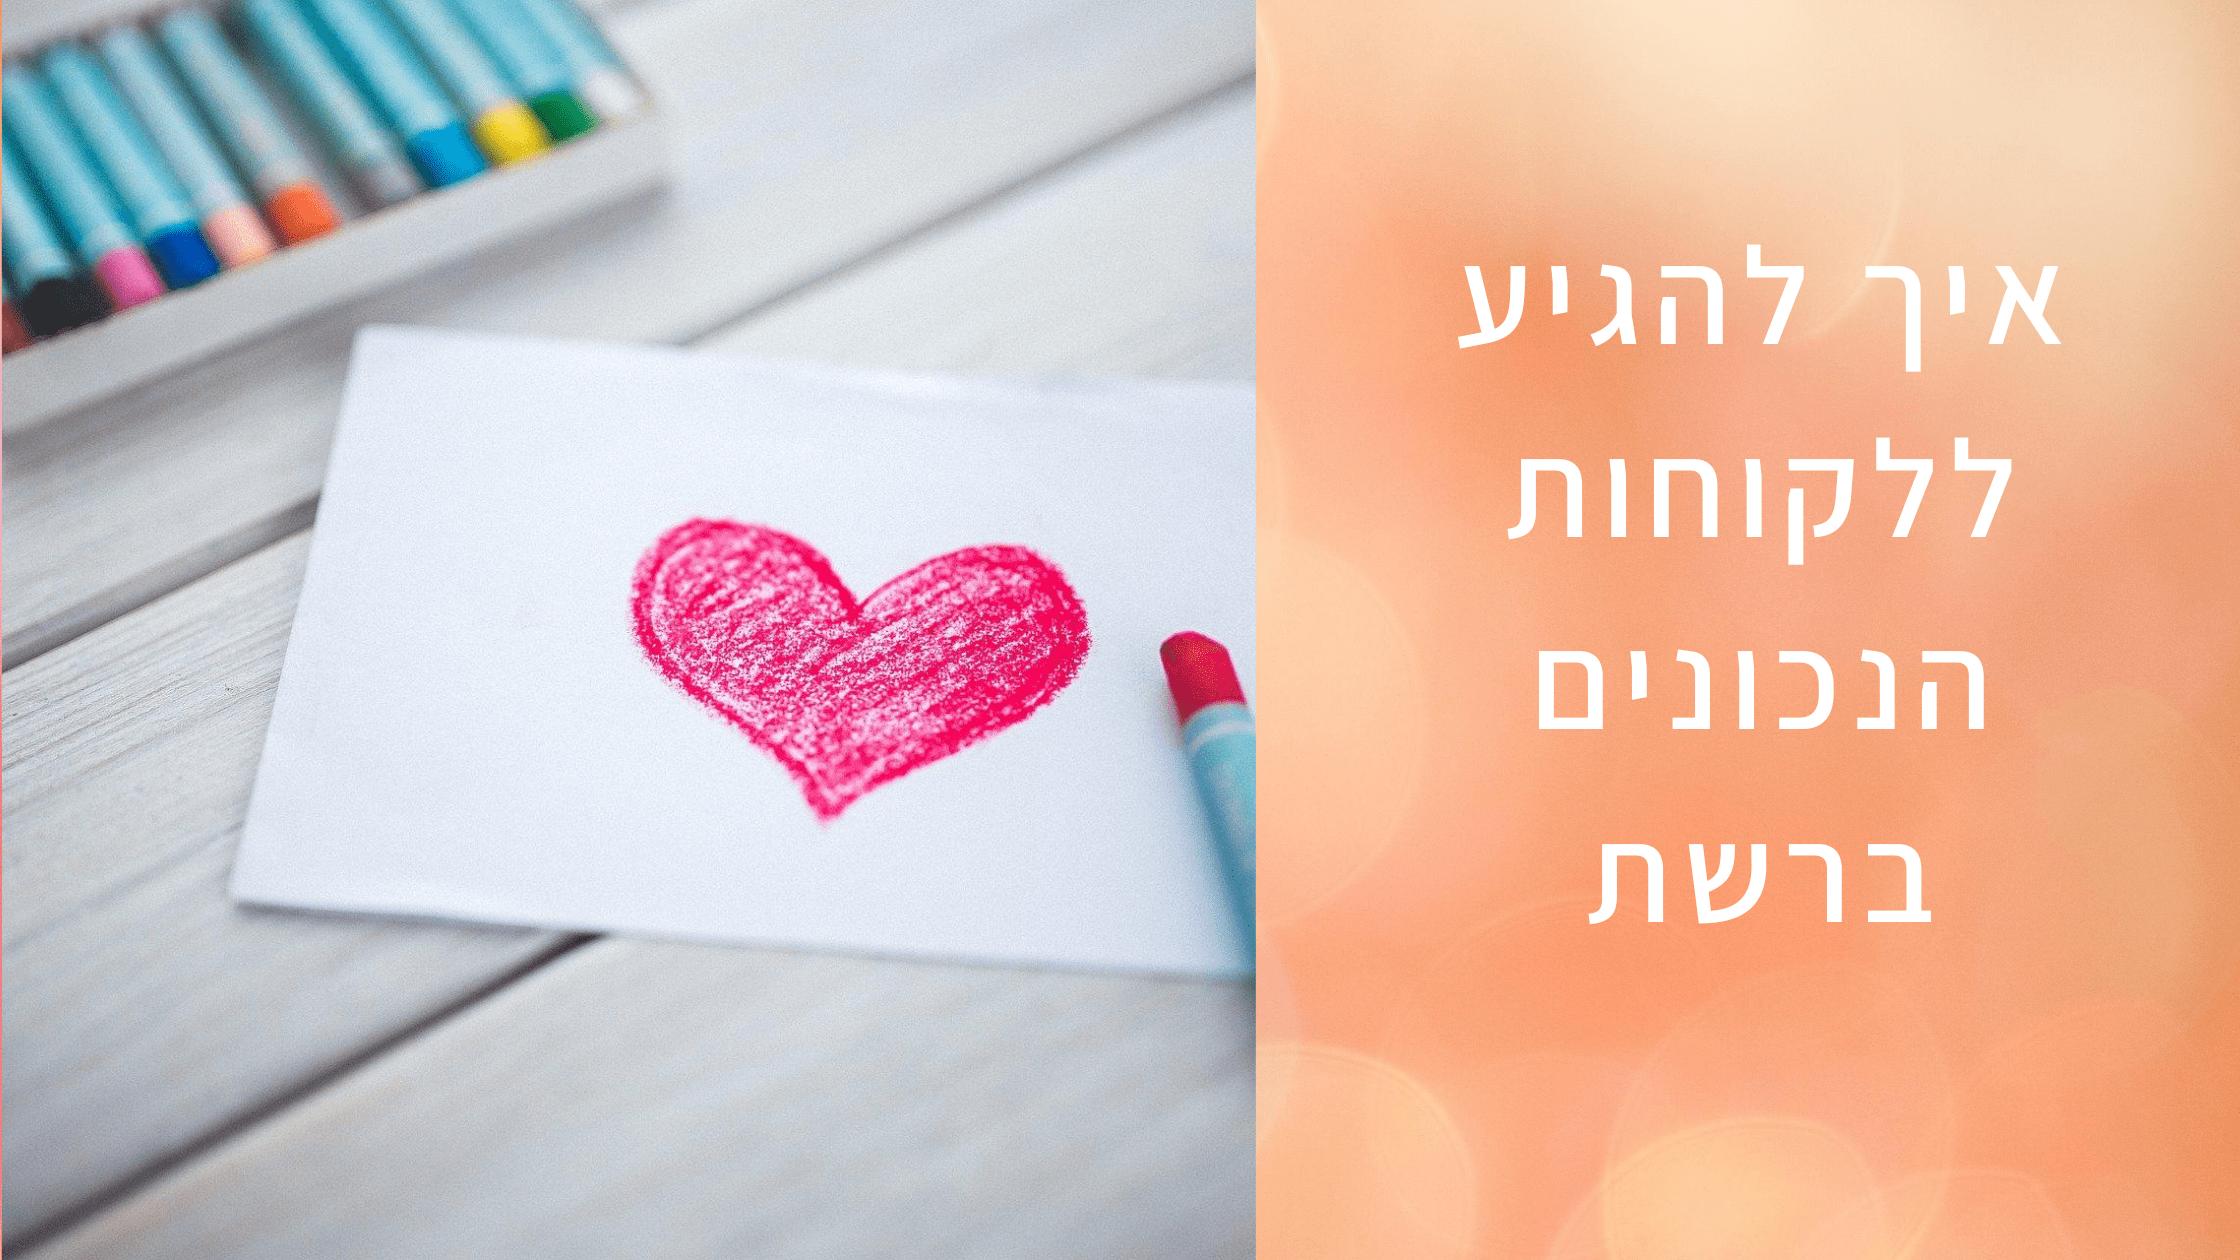 Read more about the article הגולש האלמוני: איך למשוך את הלקוחות הנכונים מהרשת